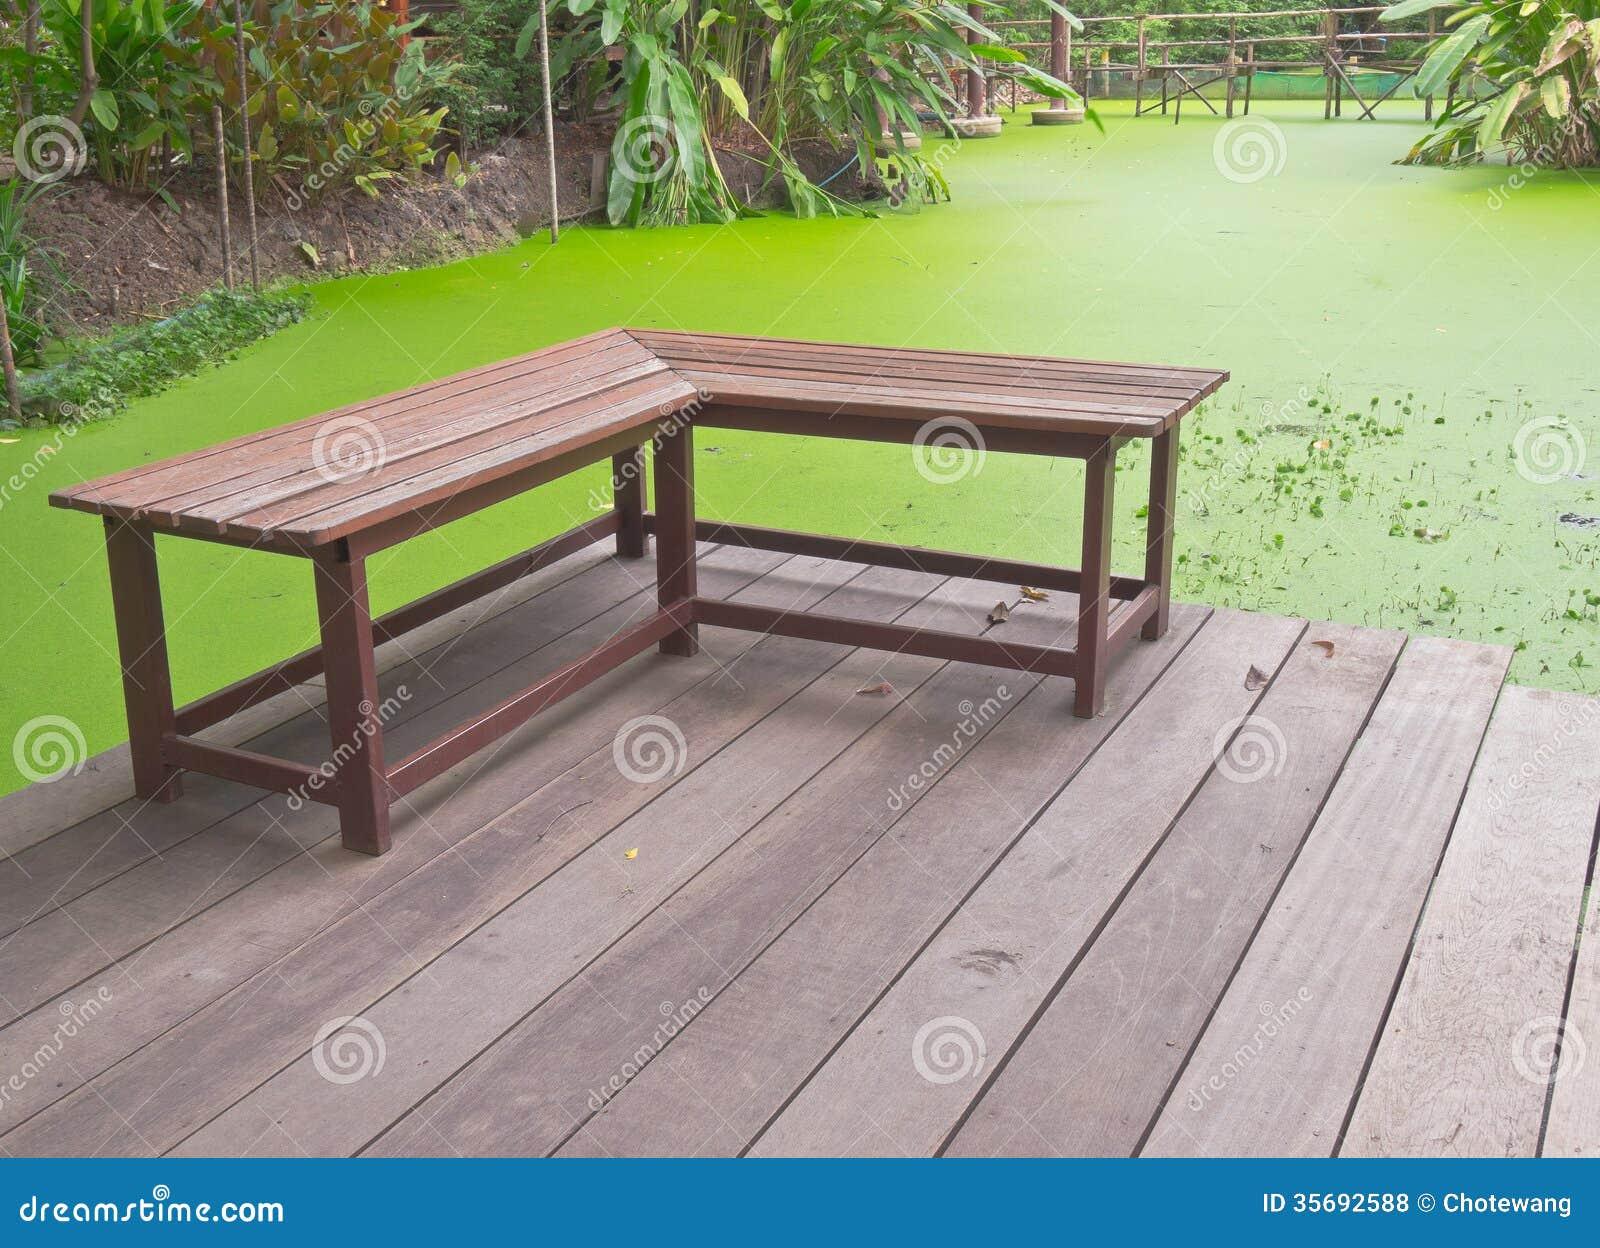 banc en bois angle droit sur la v randa pr s de l 39 tang vert de la lenticule photos libres de. Black Bedroom Furniture Sets. Home Design Ideas